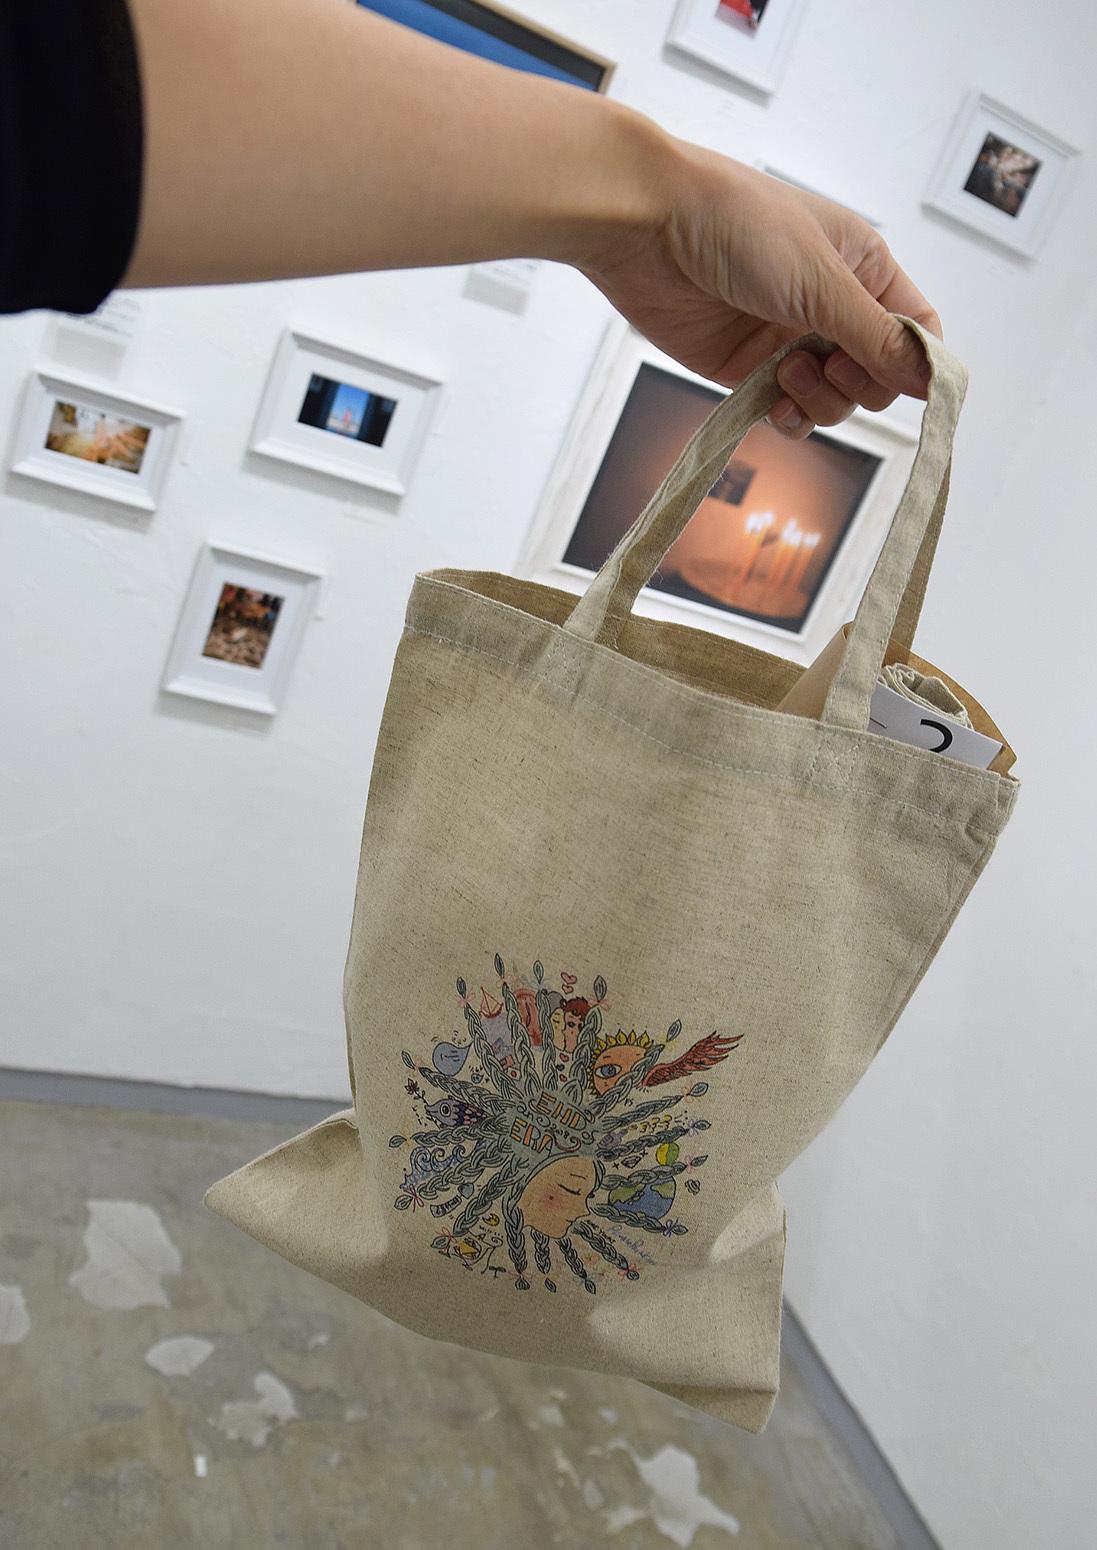 裕木奈江写真展  Nae Yuuki Exhibition Private Paradises End of an era 2018.8.29(水)~9.3(月) @1日目_e0272050_19532313.jpg